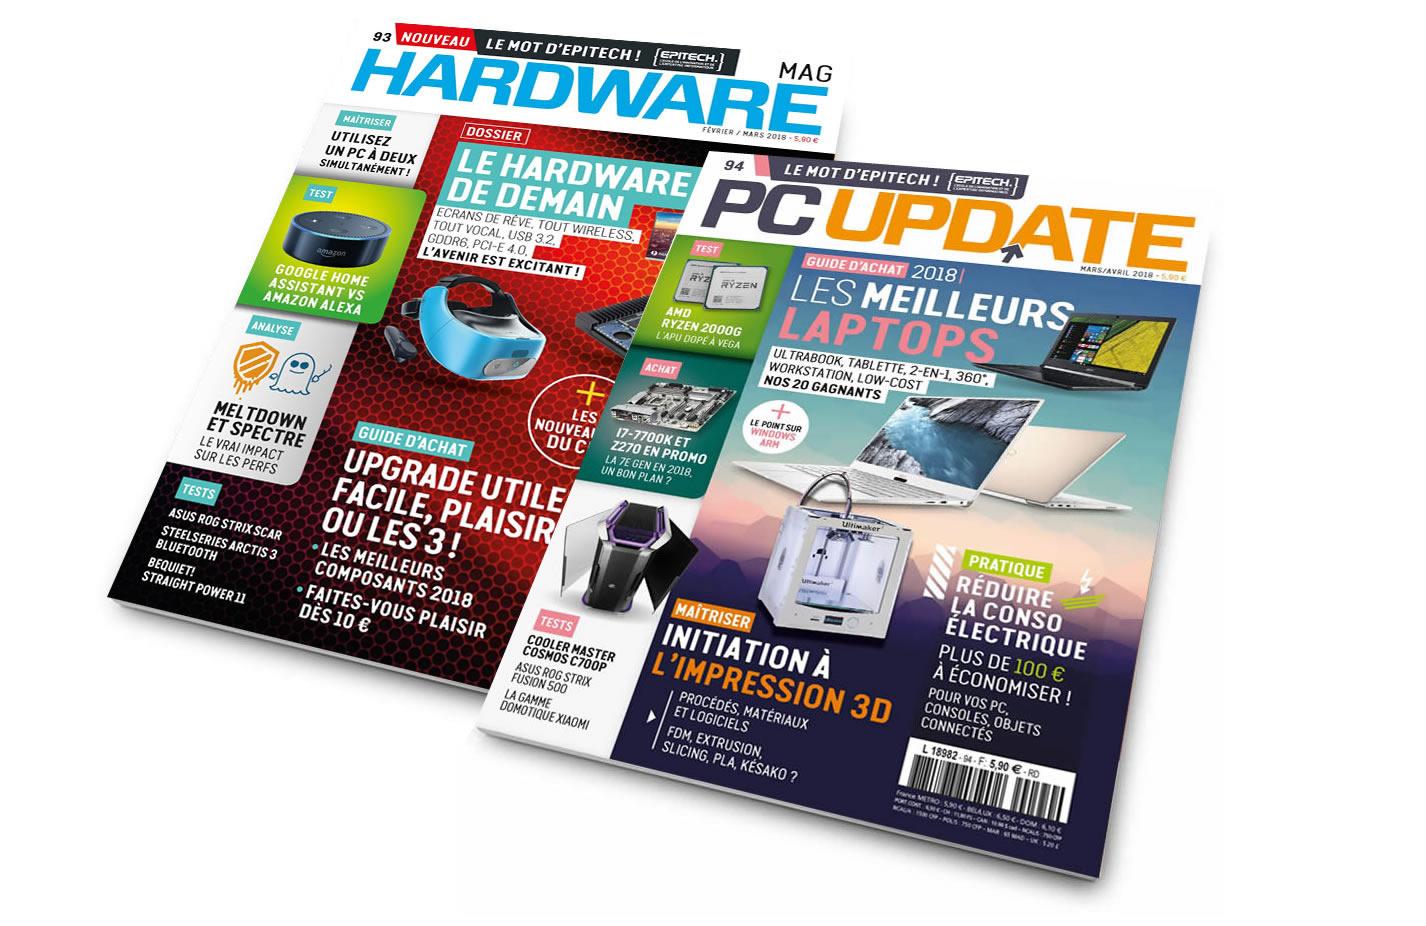 Hardware MAG & PC Update